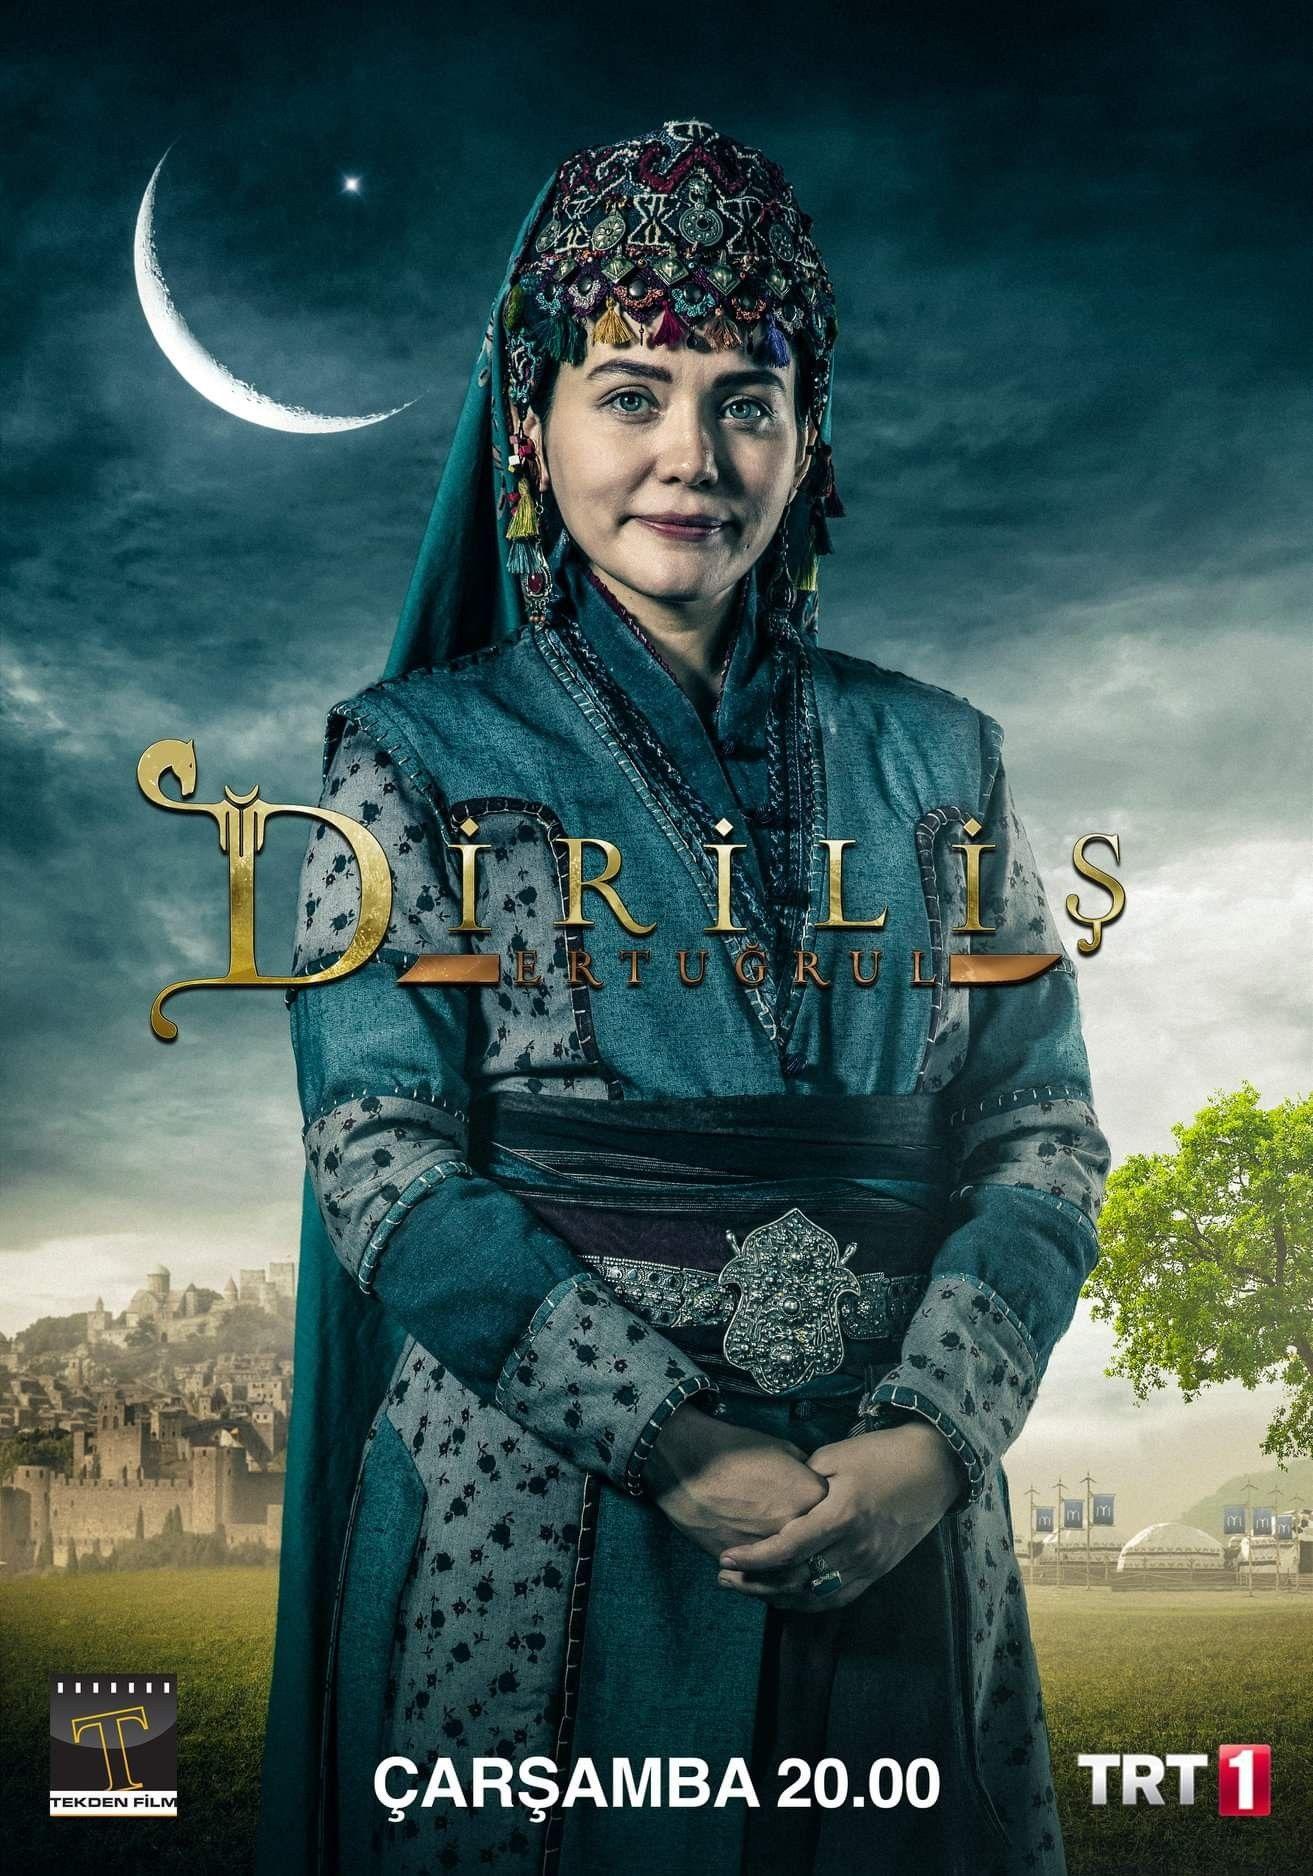 Dirilis Ertugrul, season 5 | Ertugrul in 2019 | Fictional